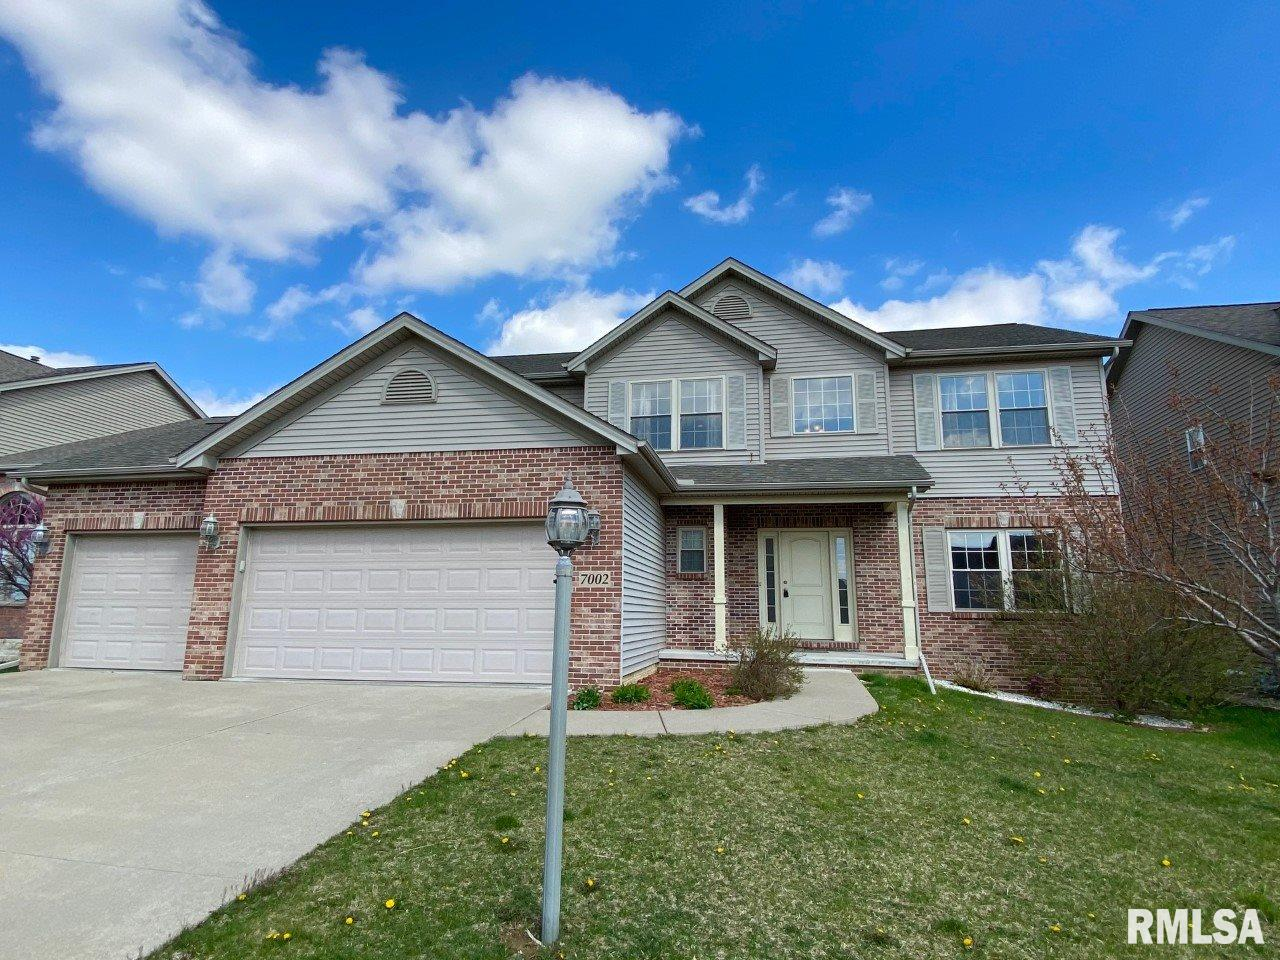 7002 N BUCKEYE Property Photo - Edwards, IL real estate listing